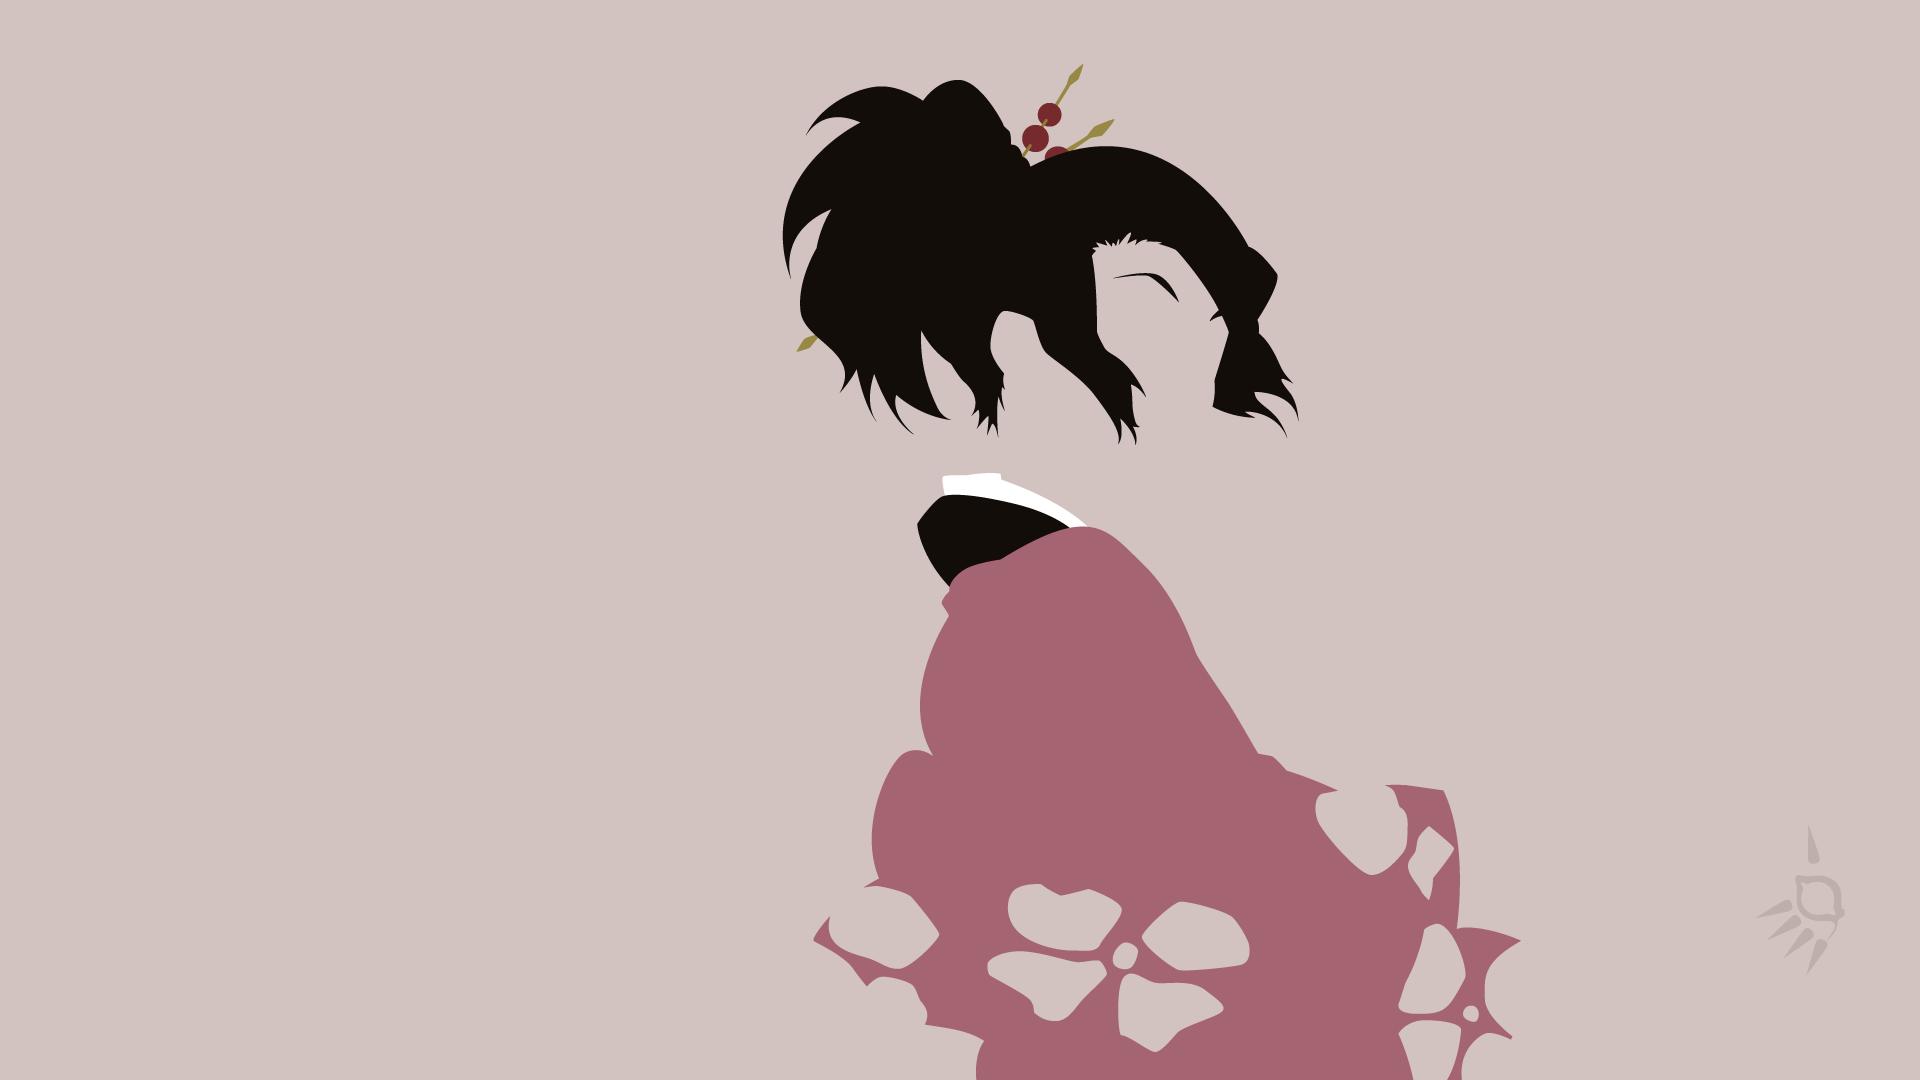 Samurai Champloo Samurai Champloo Anime Wallpaper Samurai Anime